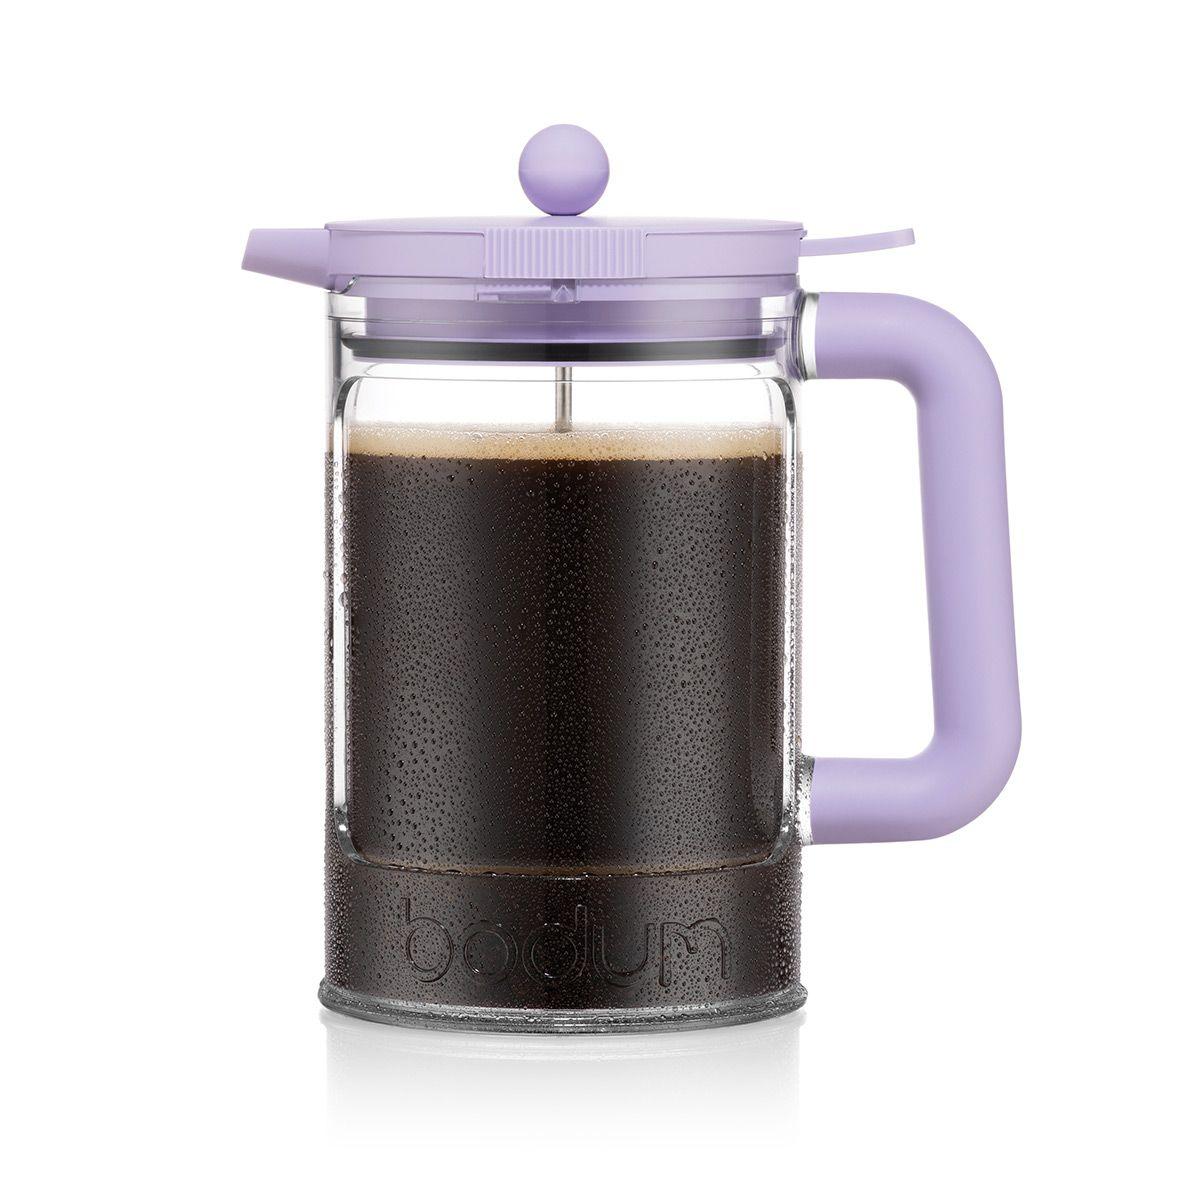 cold brew coffee maker BEAN